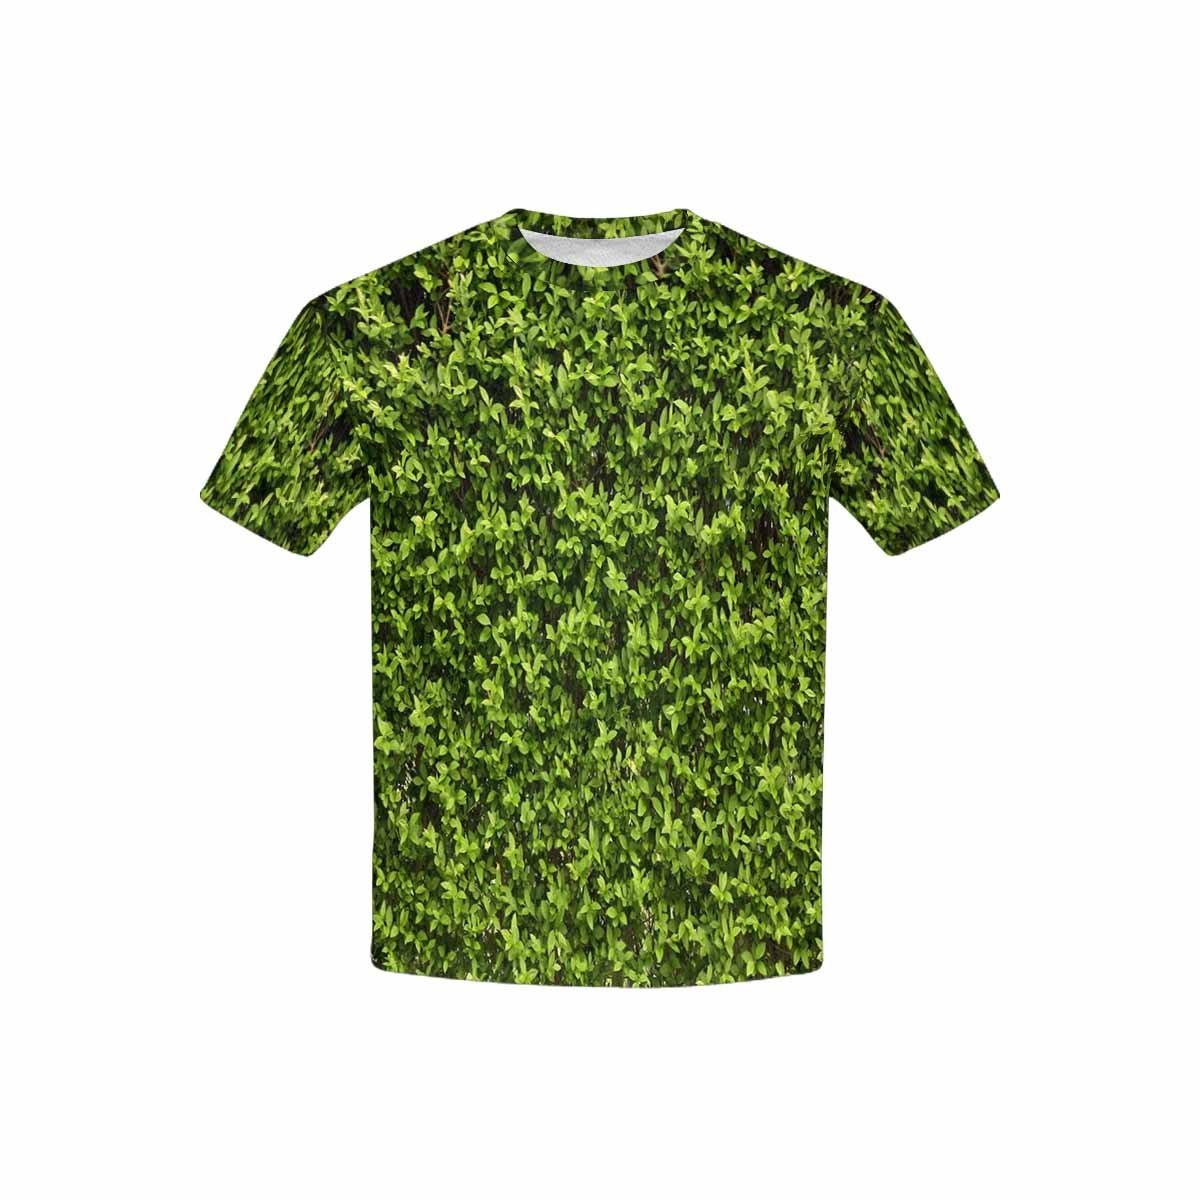 XS-XL INTERESTPRINT Youth T-Shirts Green Leaves Wall